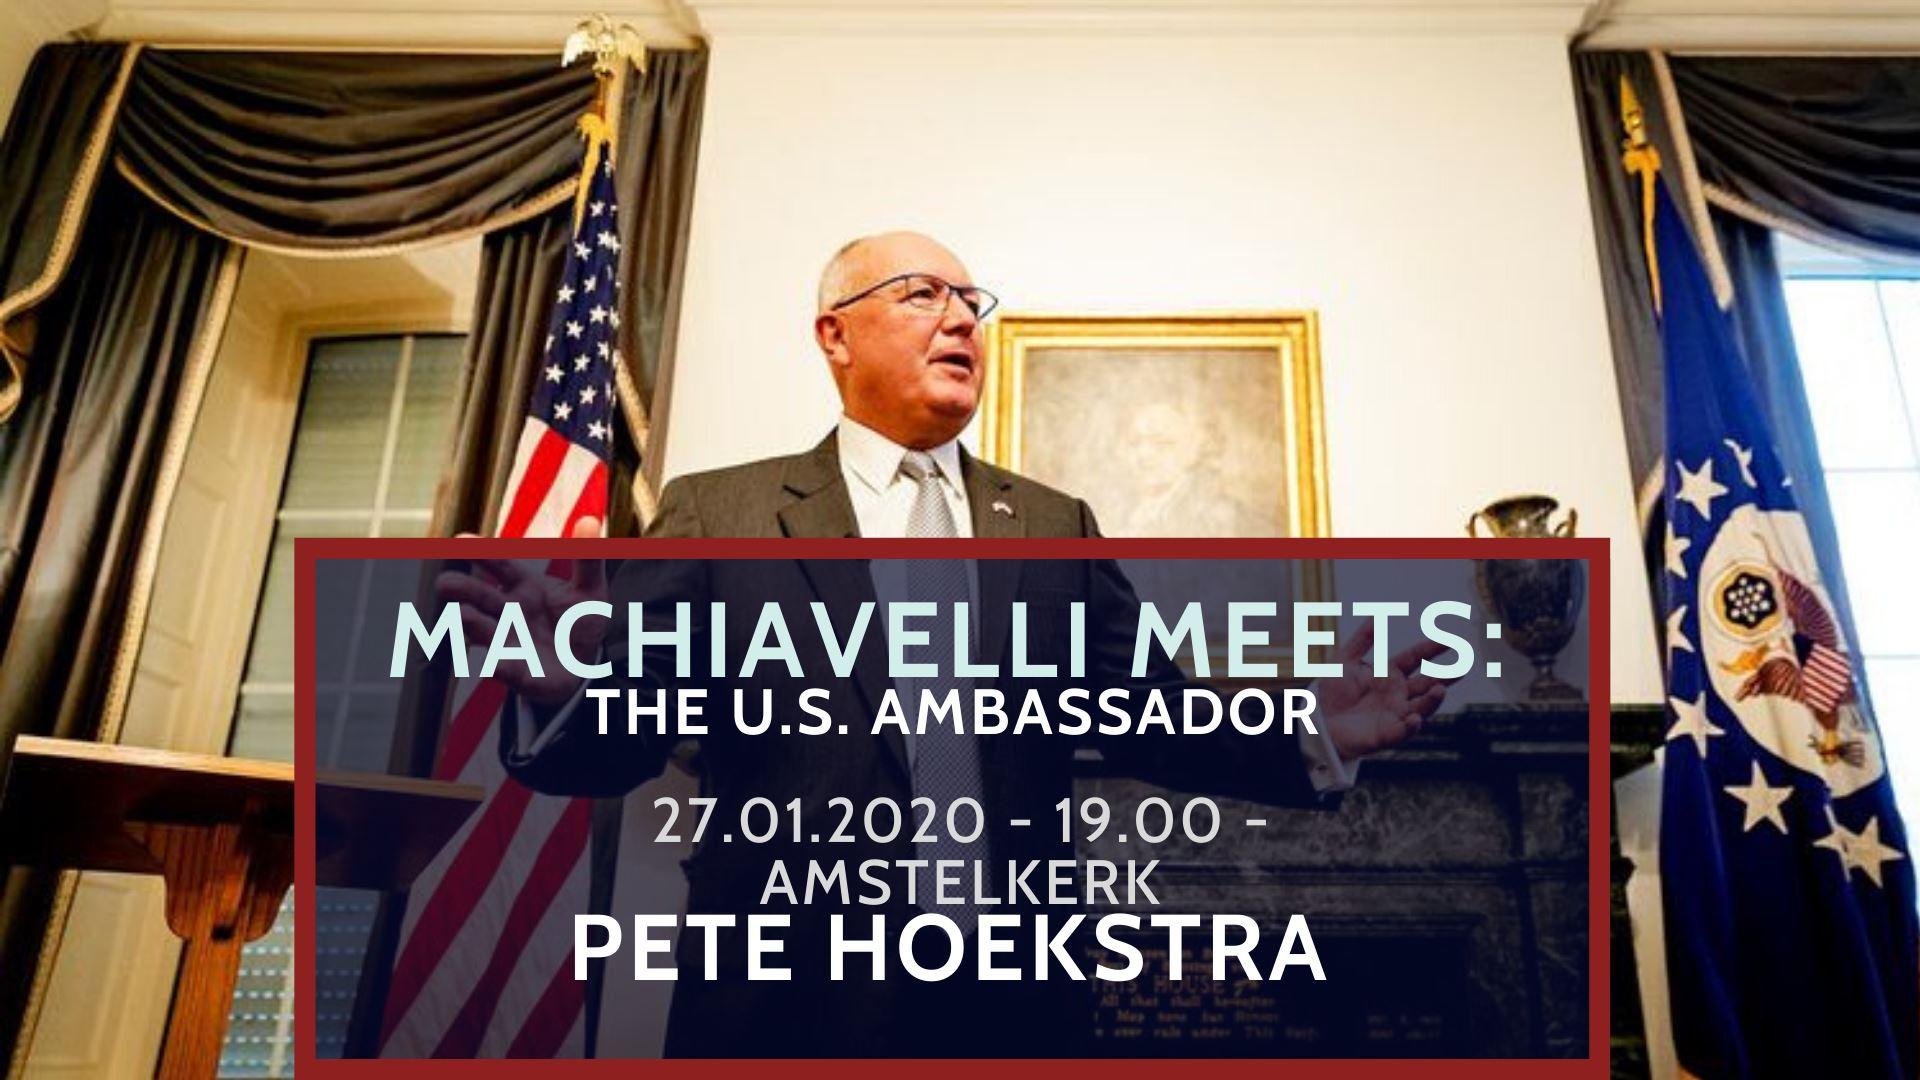 Machiavelli Meets: Pete Hoekstra